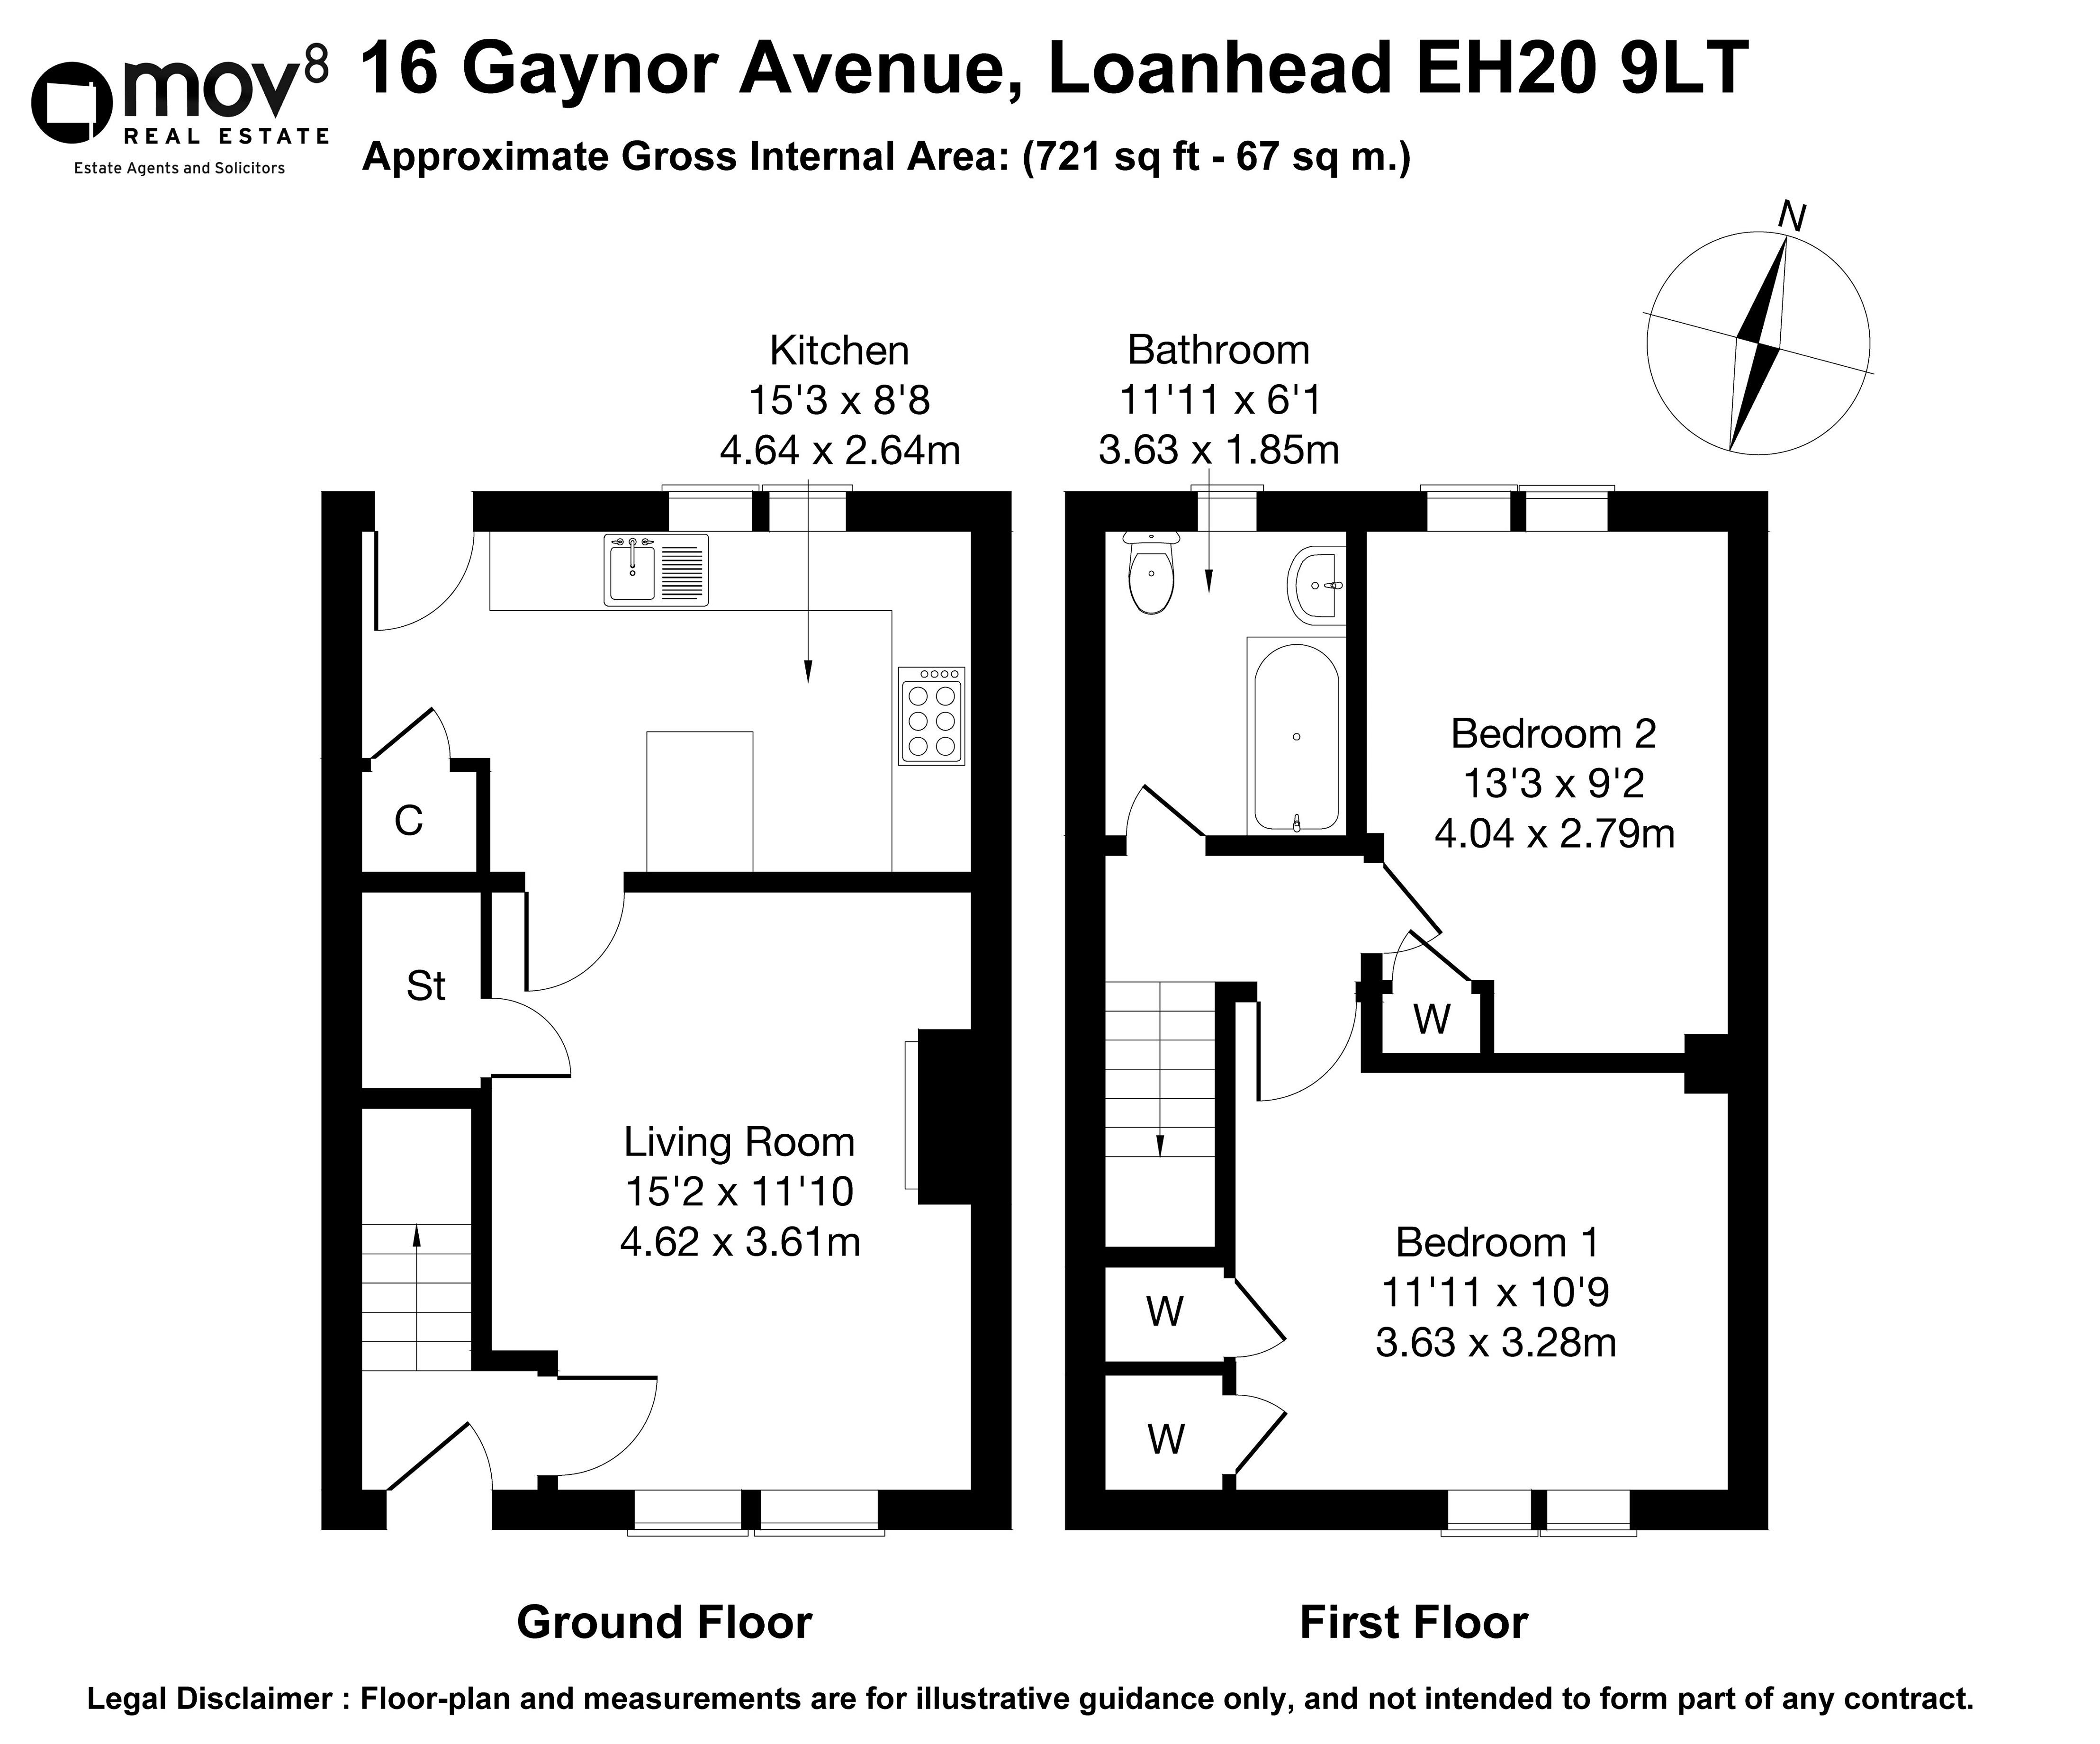 Floorplan 1 of 16 Gaynor Avenue, Loanhead, Midlothian, EH20 9LT